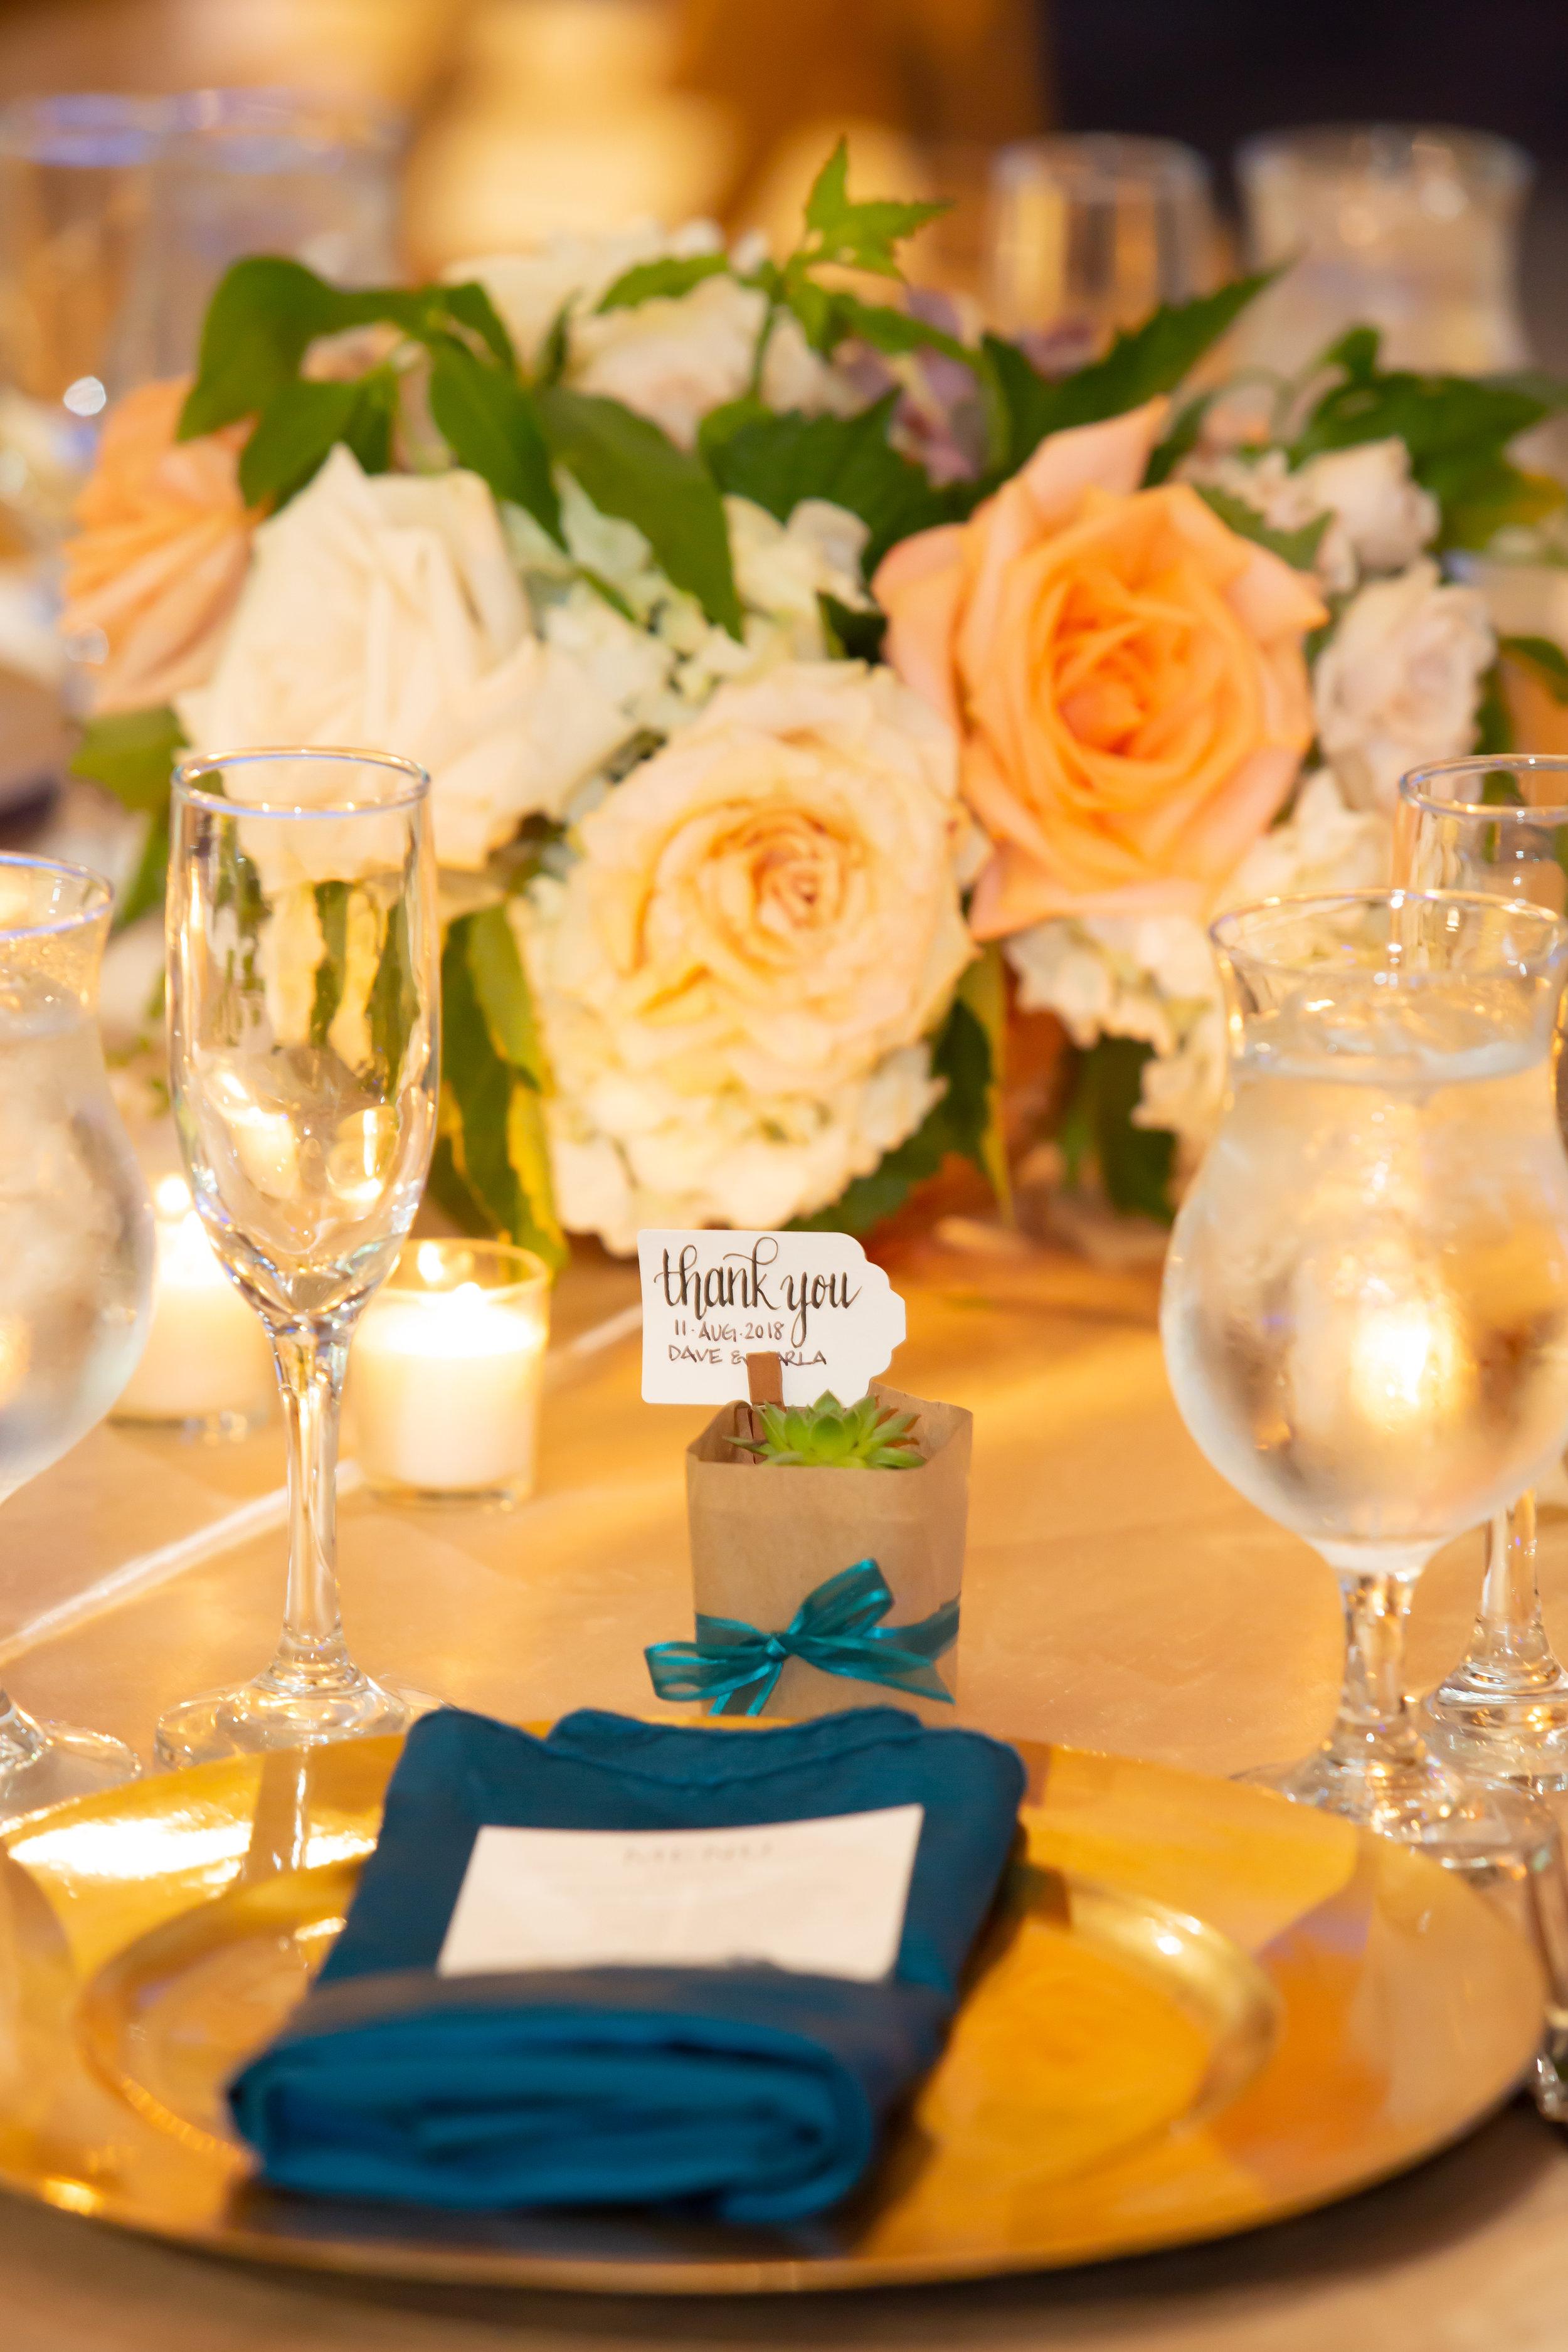 San-Diego-Wedding-Japenese-Friendship-Garden-Carla-David-2018-502.jpg